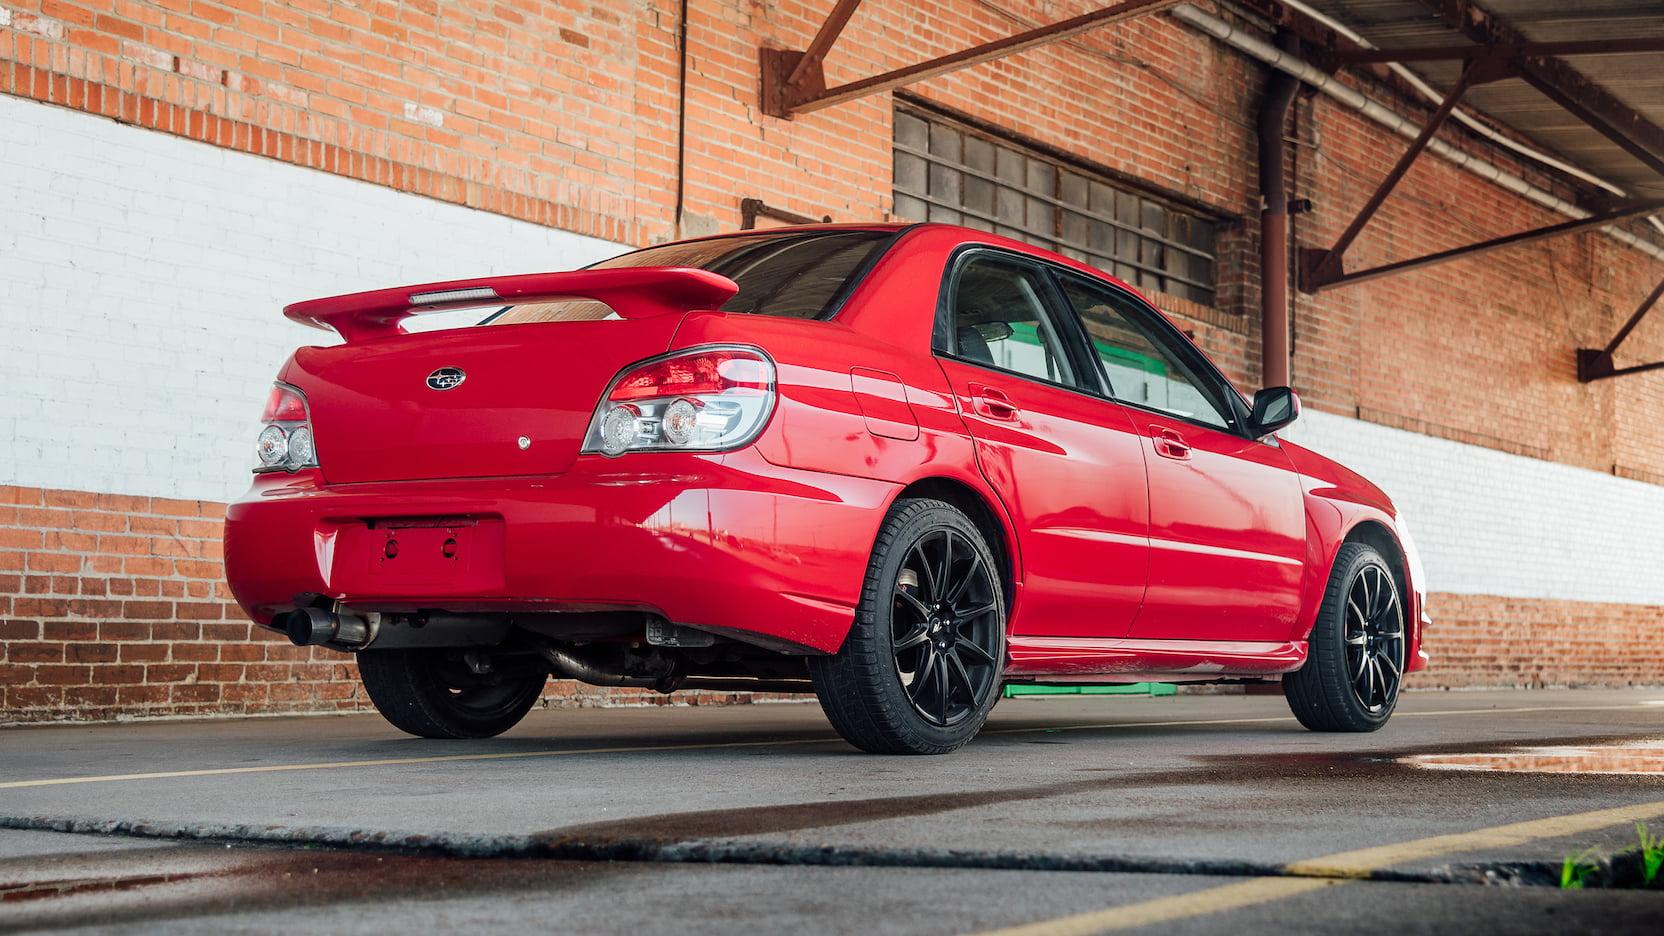 2006 Subaru WRX coupe rear 3/4